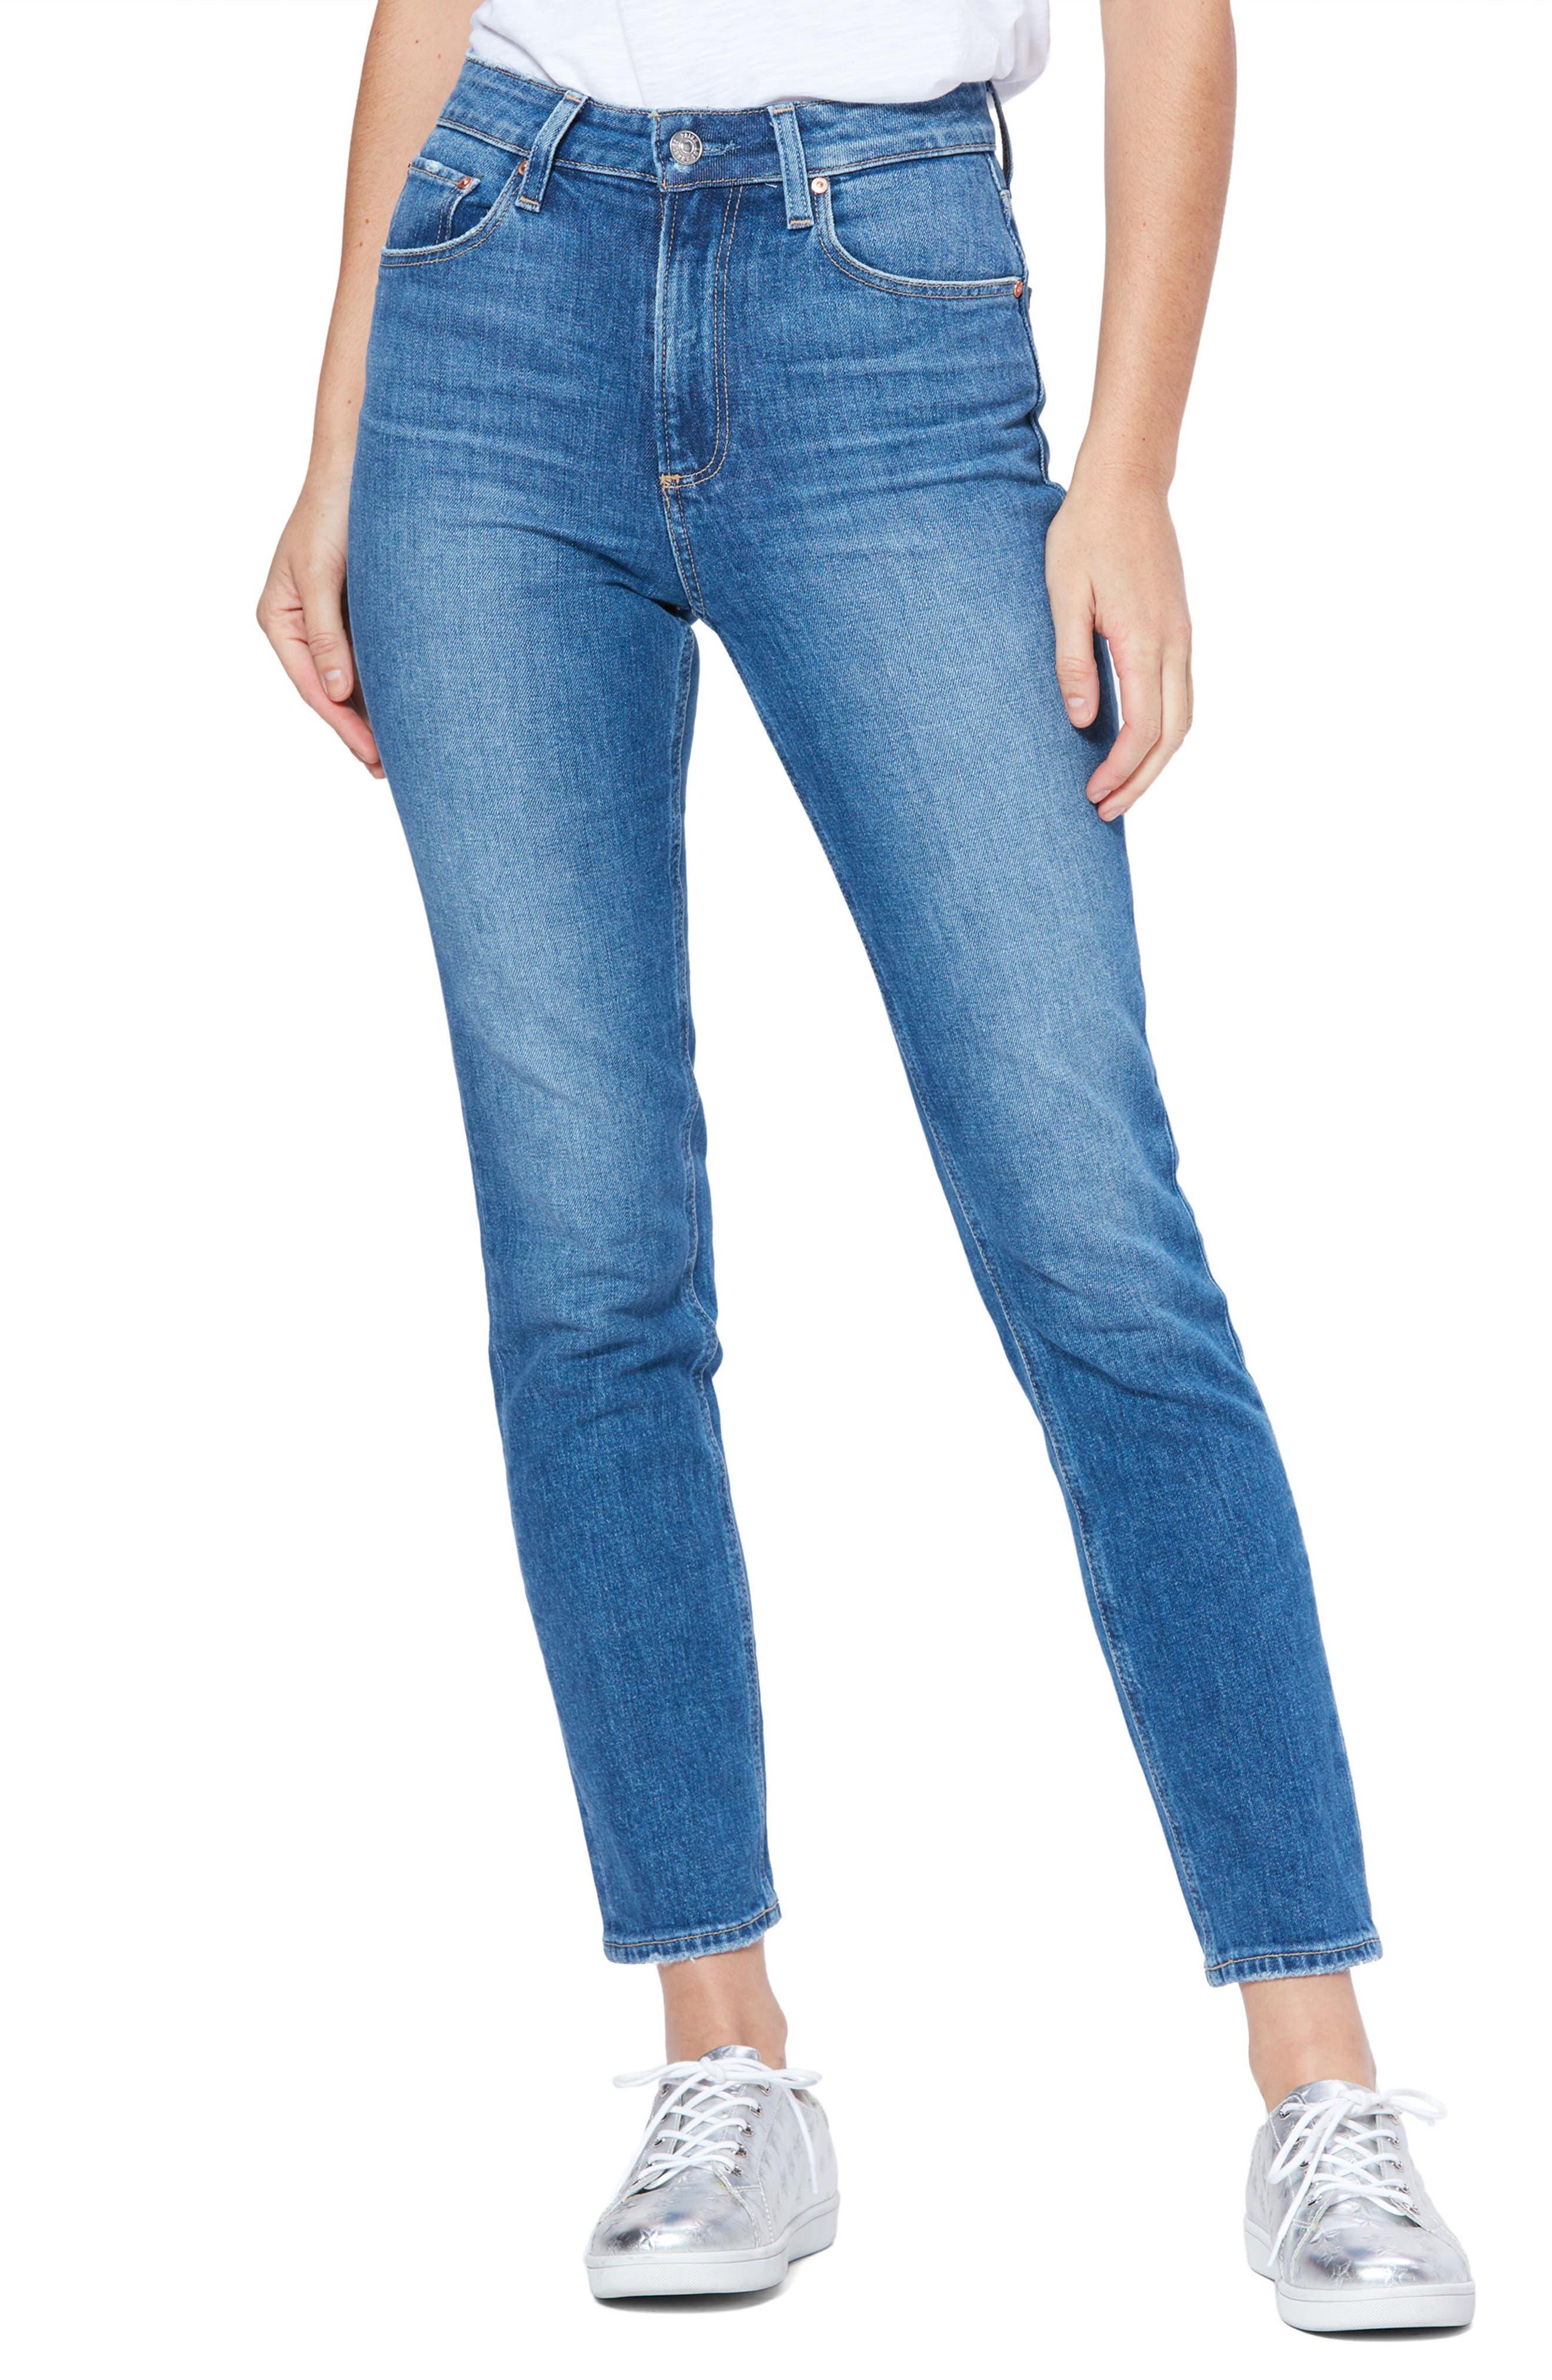 PAIGE Womens High Rise Sarah Straight Jean